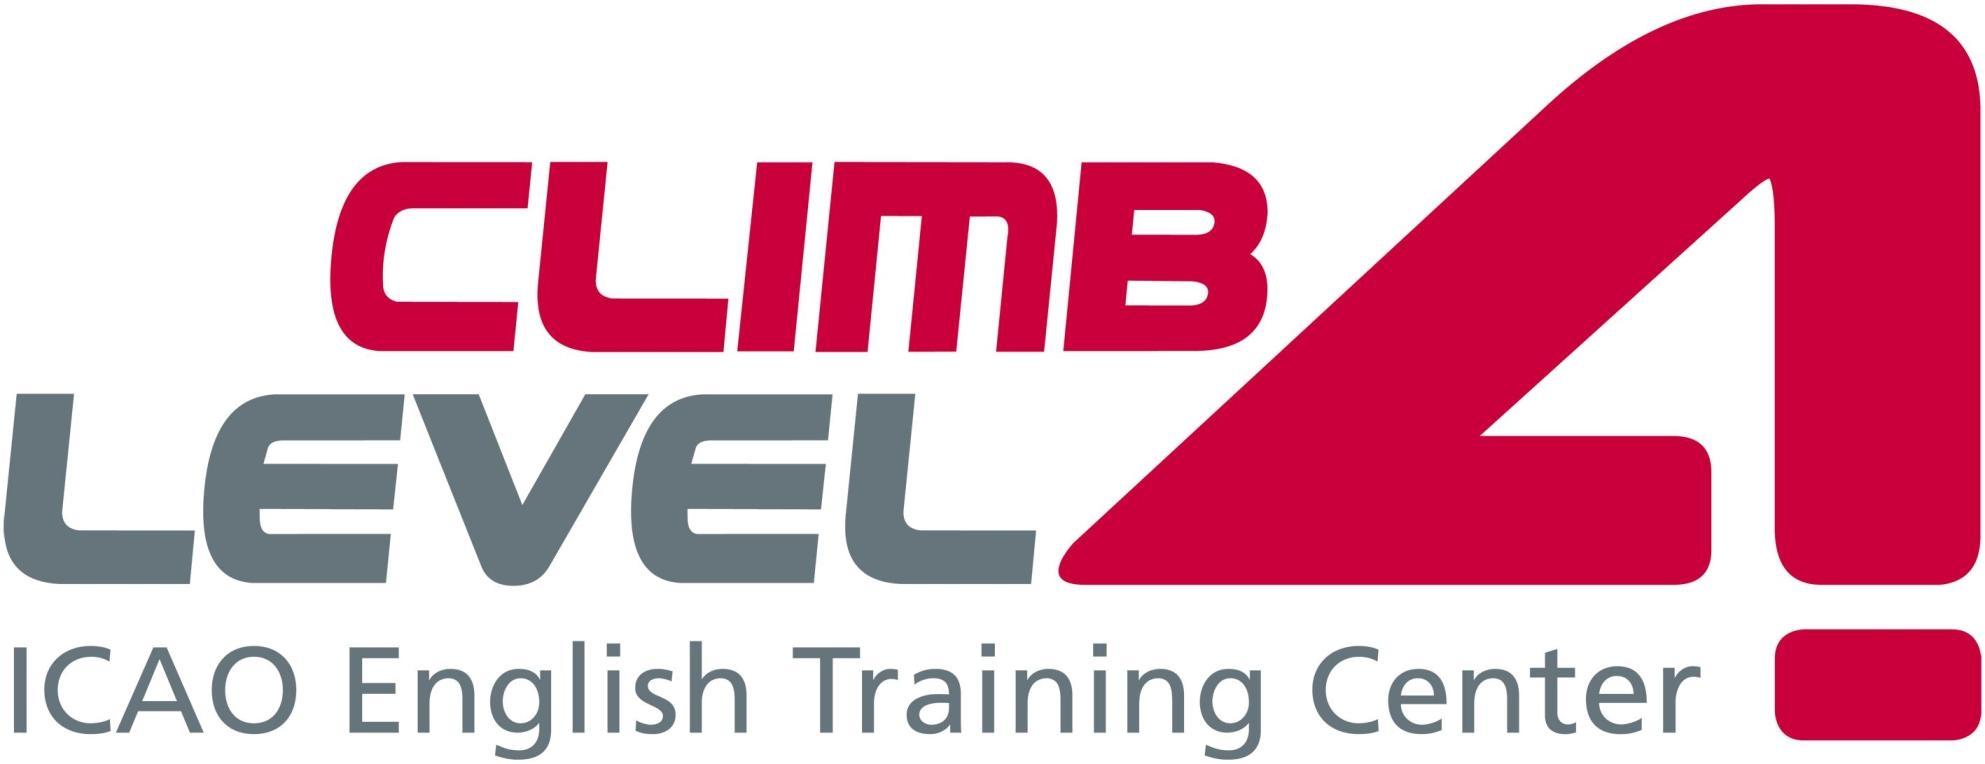 CLIMB LEVEL 4 ICAO English Training Center